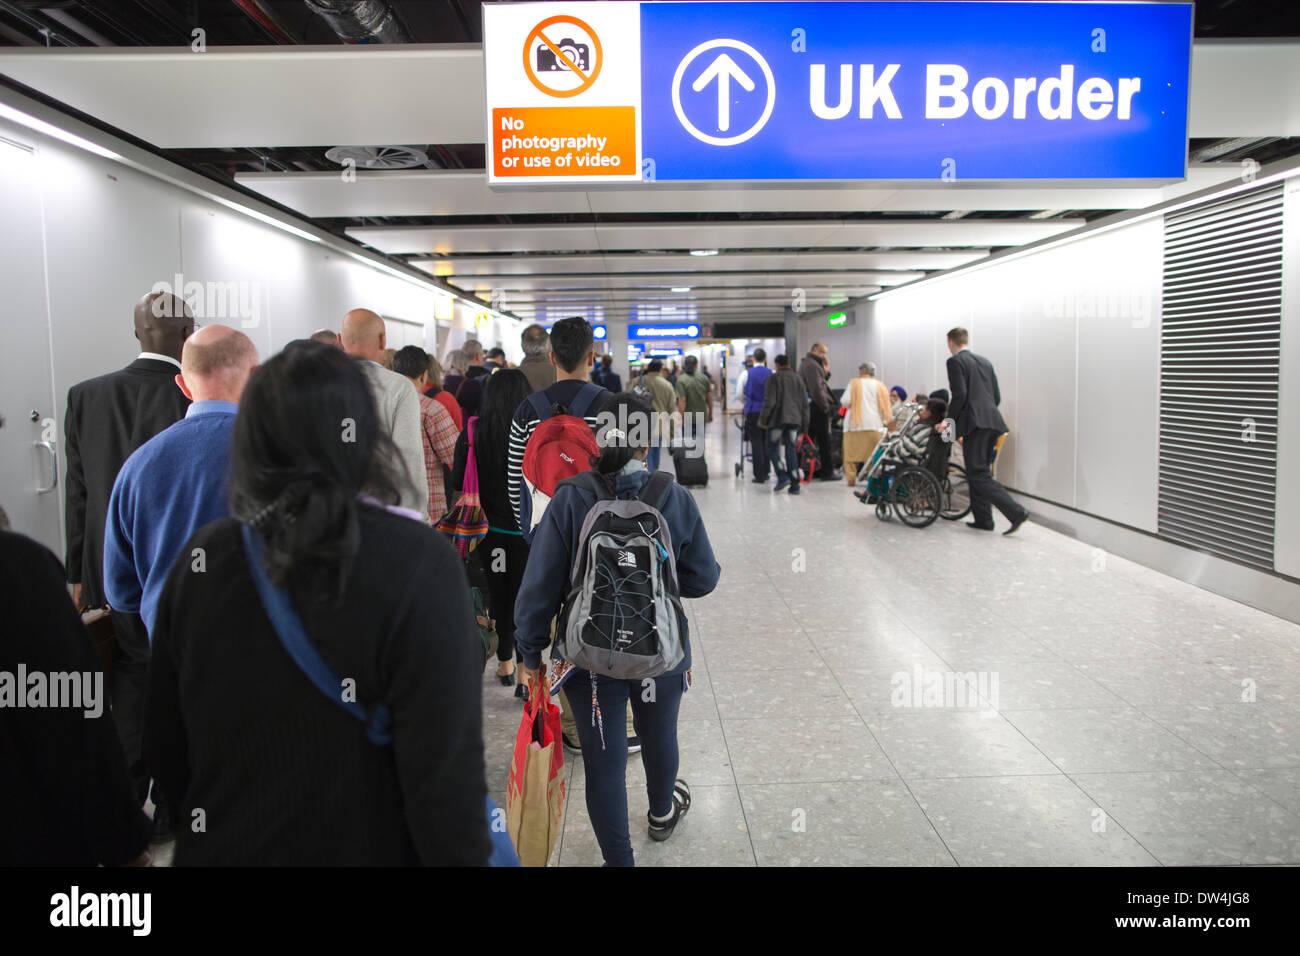 immigration uk stock photos  immigration uk stock images